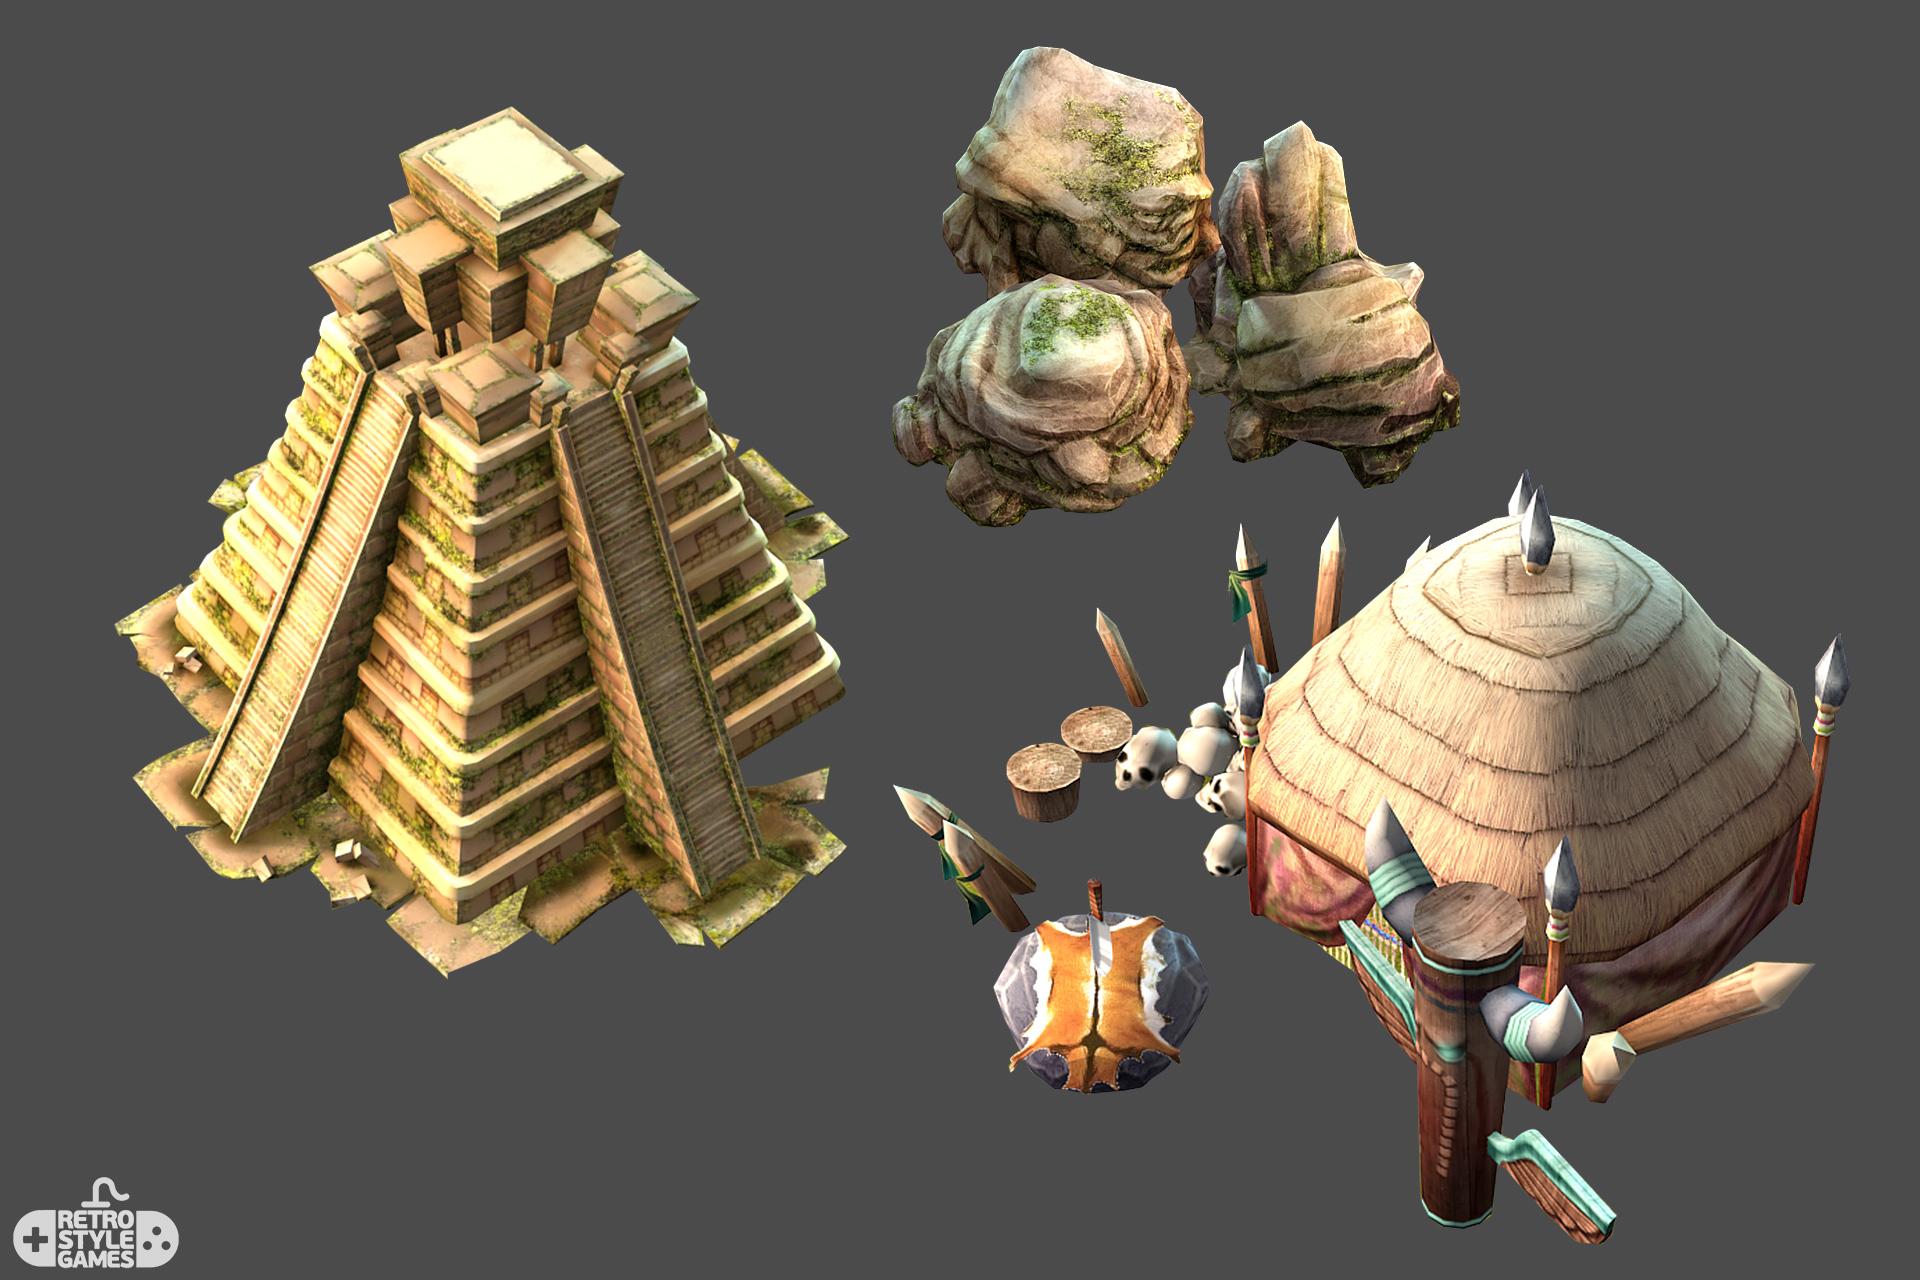 Treasure Island Pirate – Game Assets - RetroStyle Games